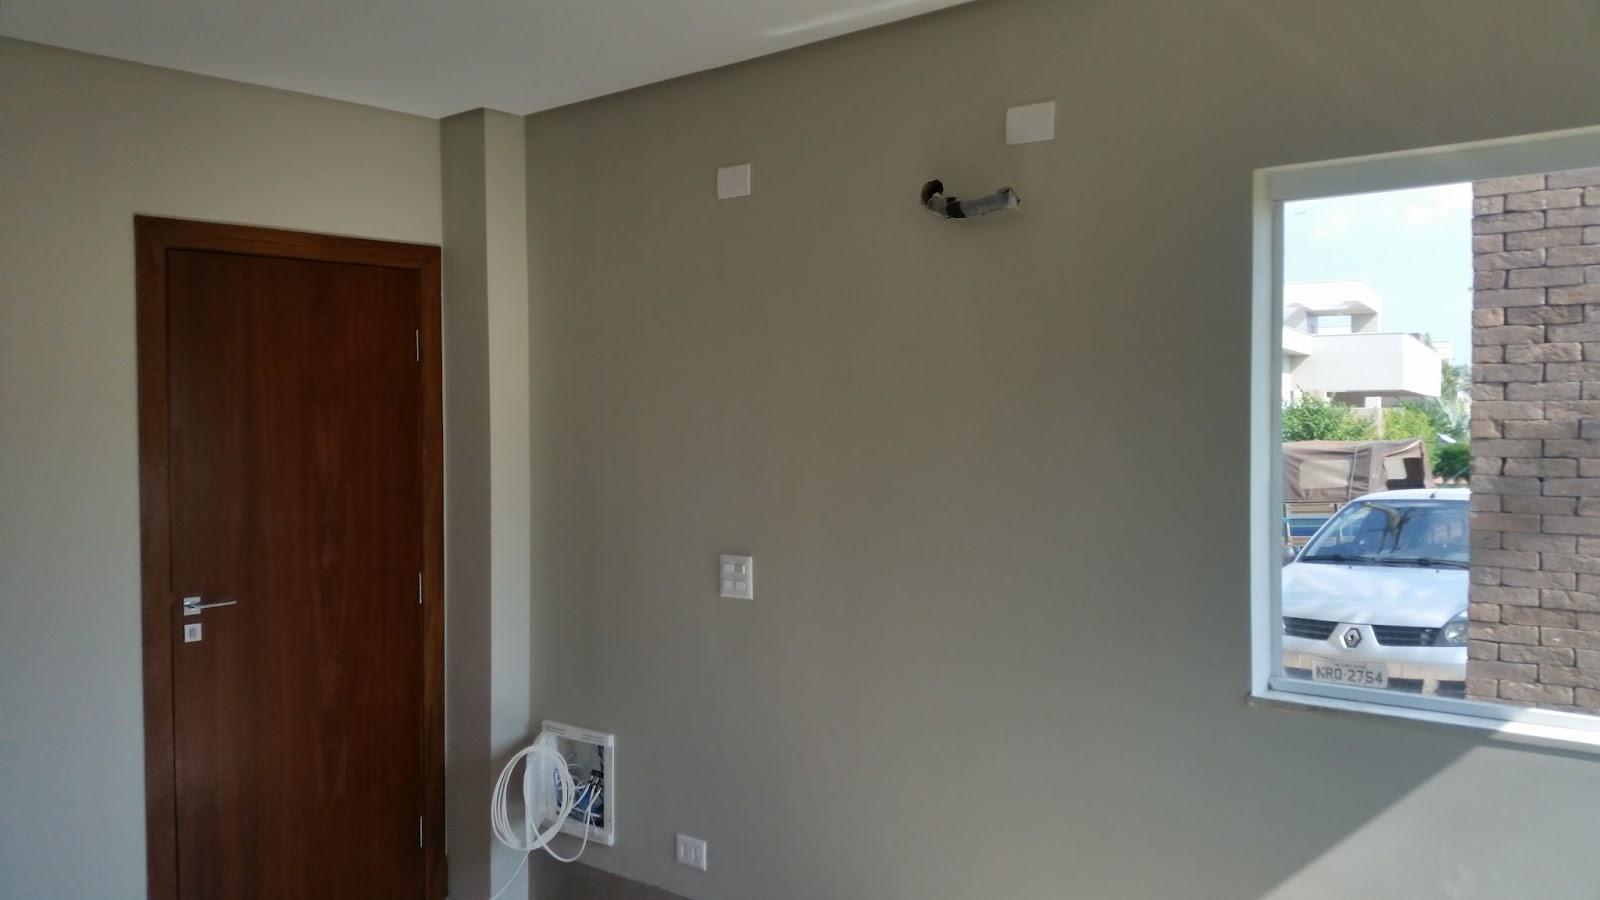 Pinturas Campo Grande MS Casa no Residencial Damha ii ~ Quarto Pintado Branco Gelo